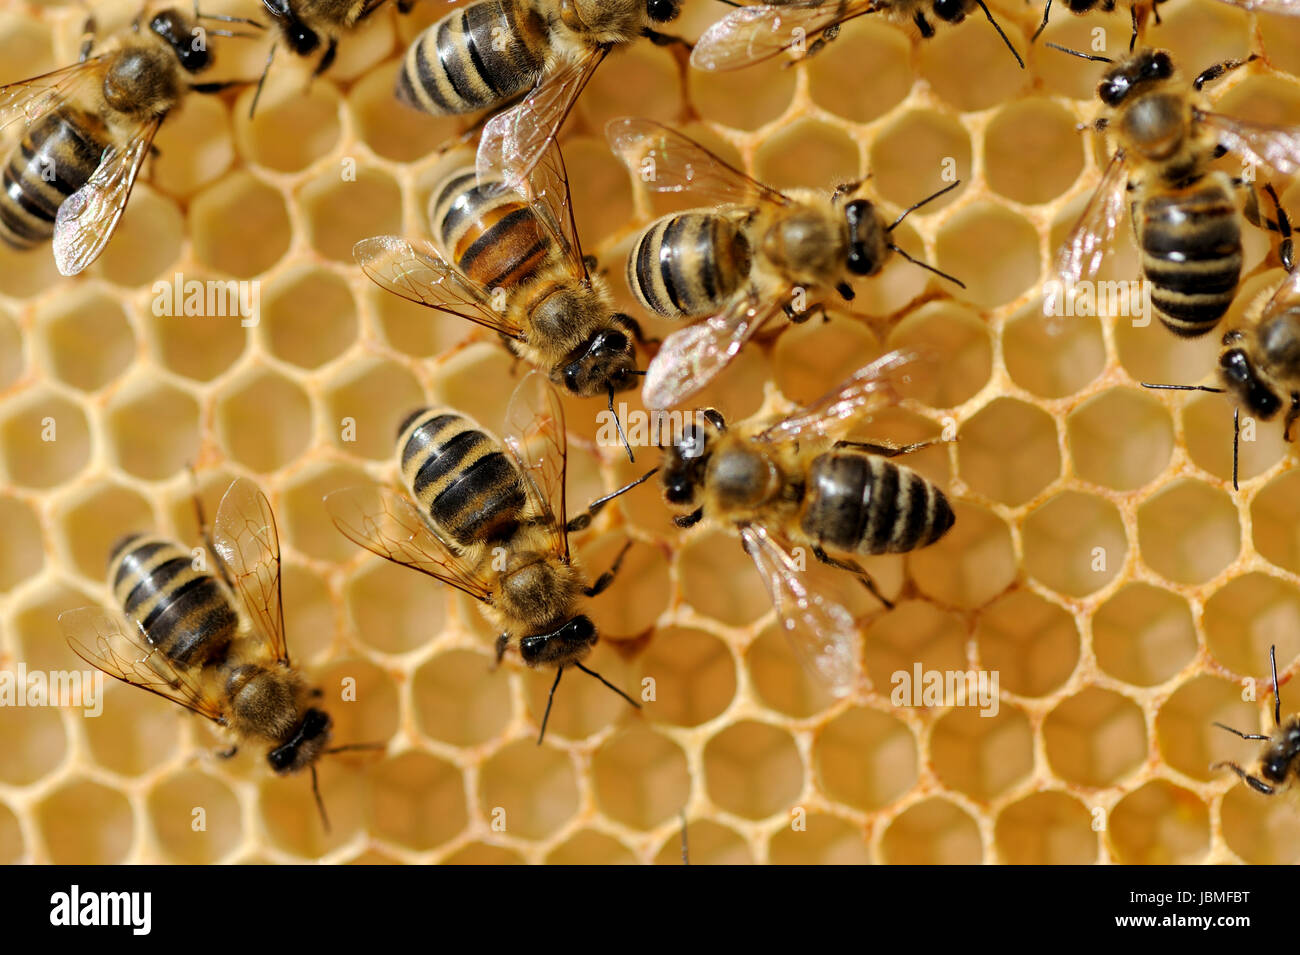 Vista de cerca de las abejas obreras en honeycells Imagen De Stock